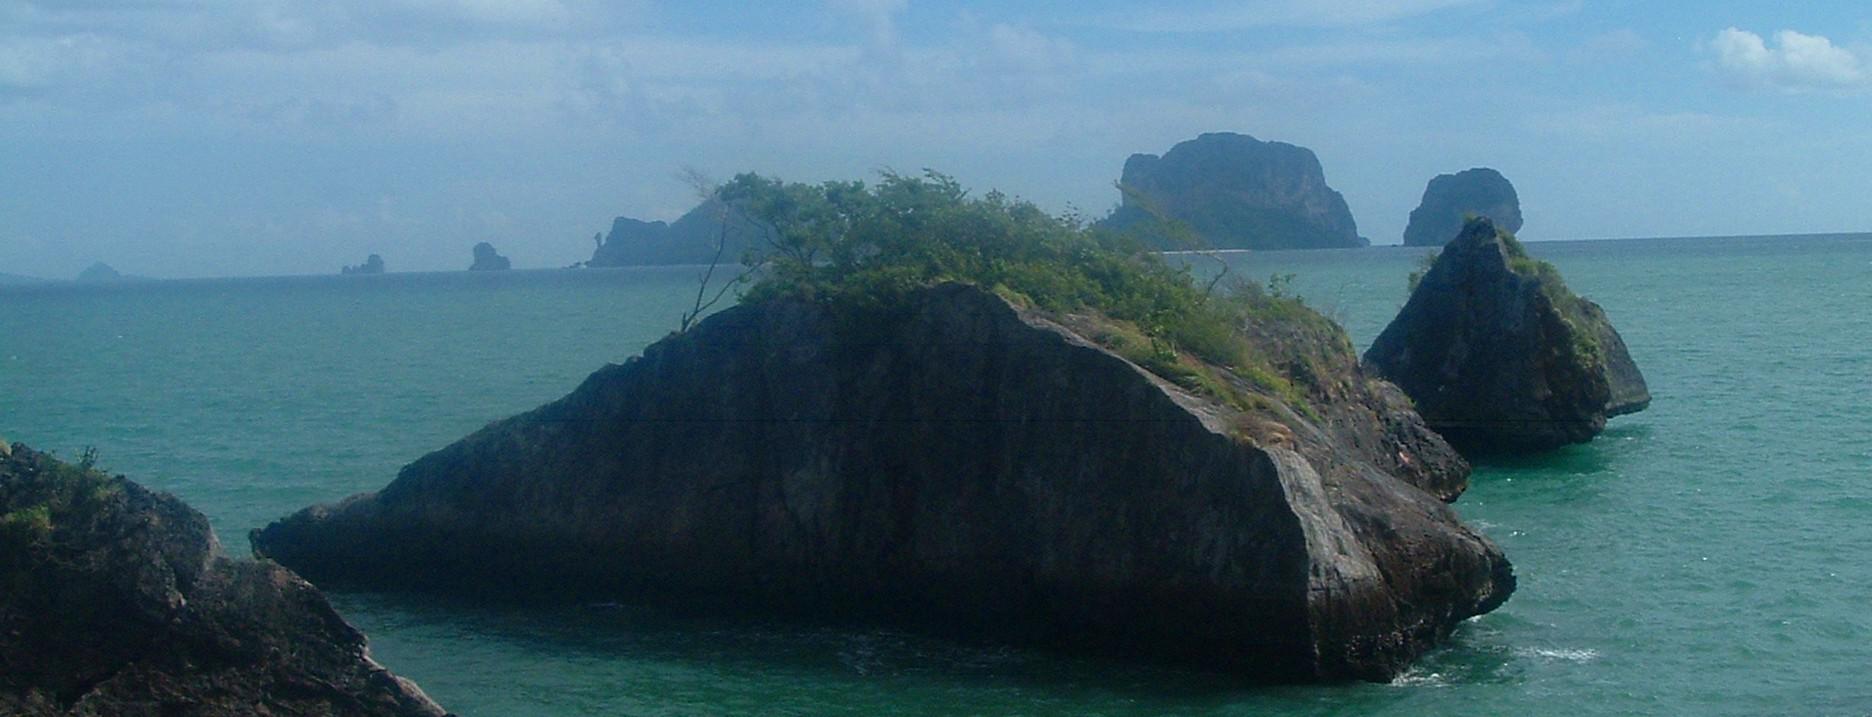 islands.JPG